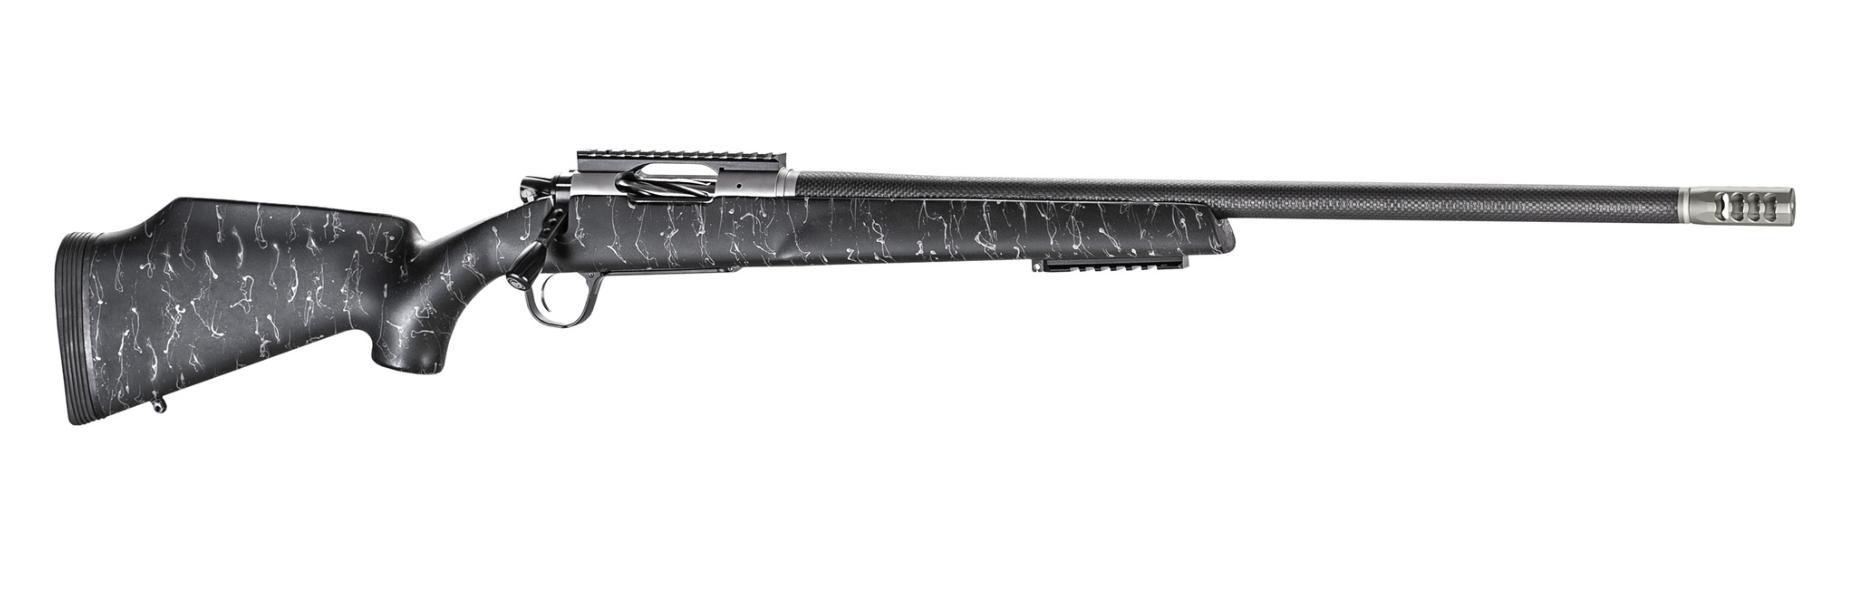 Christensen Arms Traverse 338 Lapua